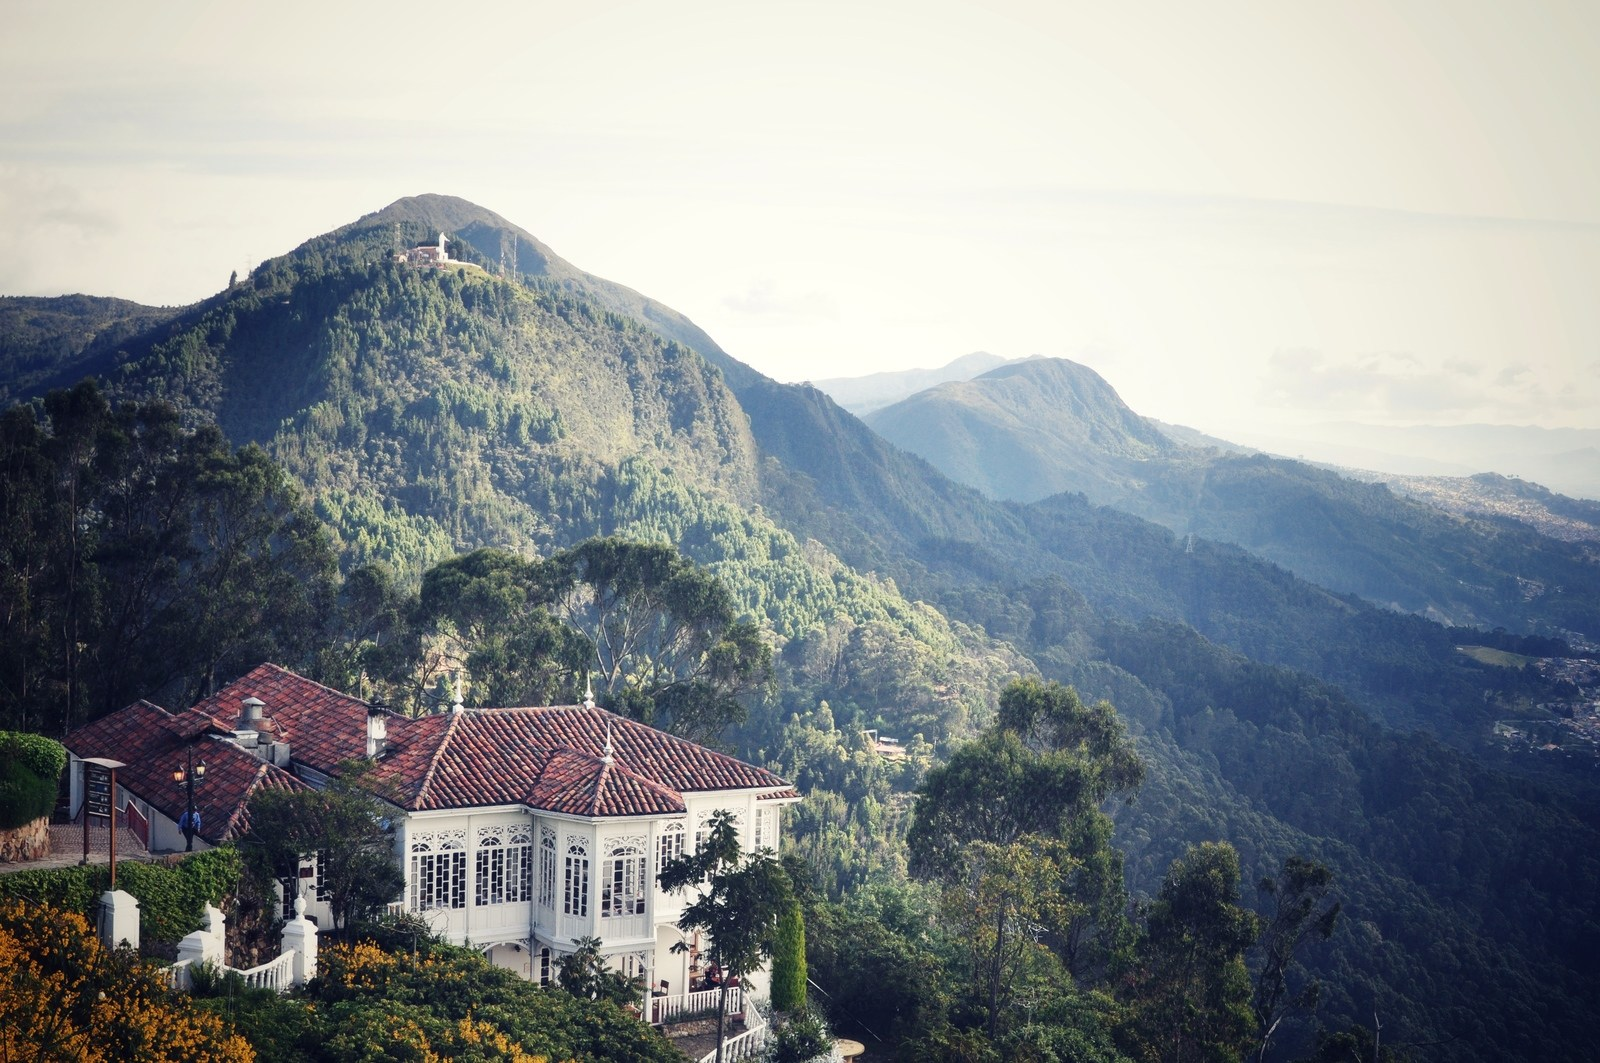 Montagnes, Monserrate, Bogota Cerro de Monserrate